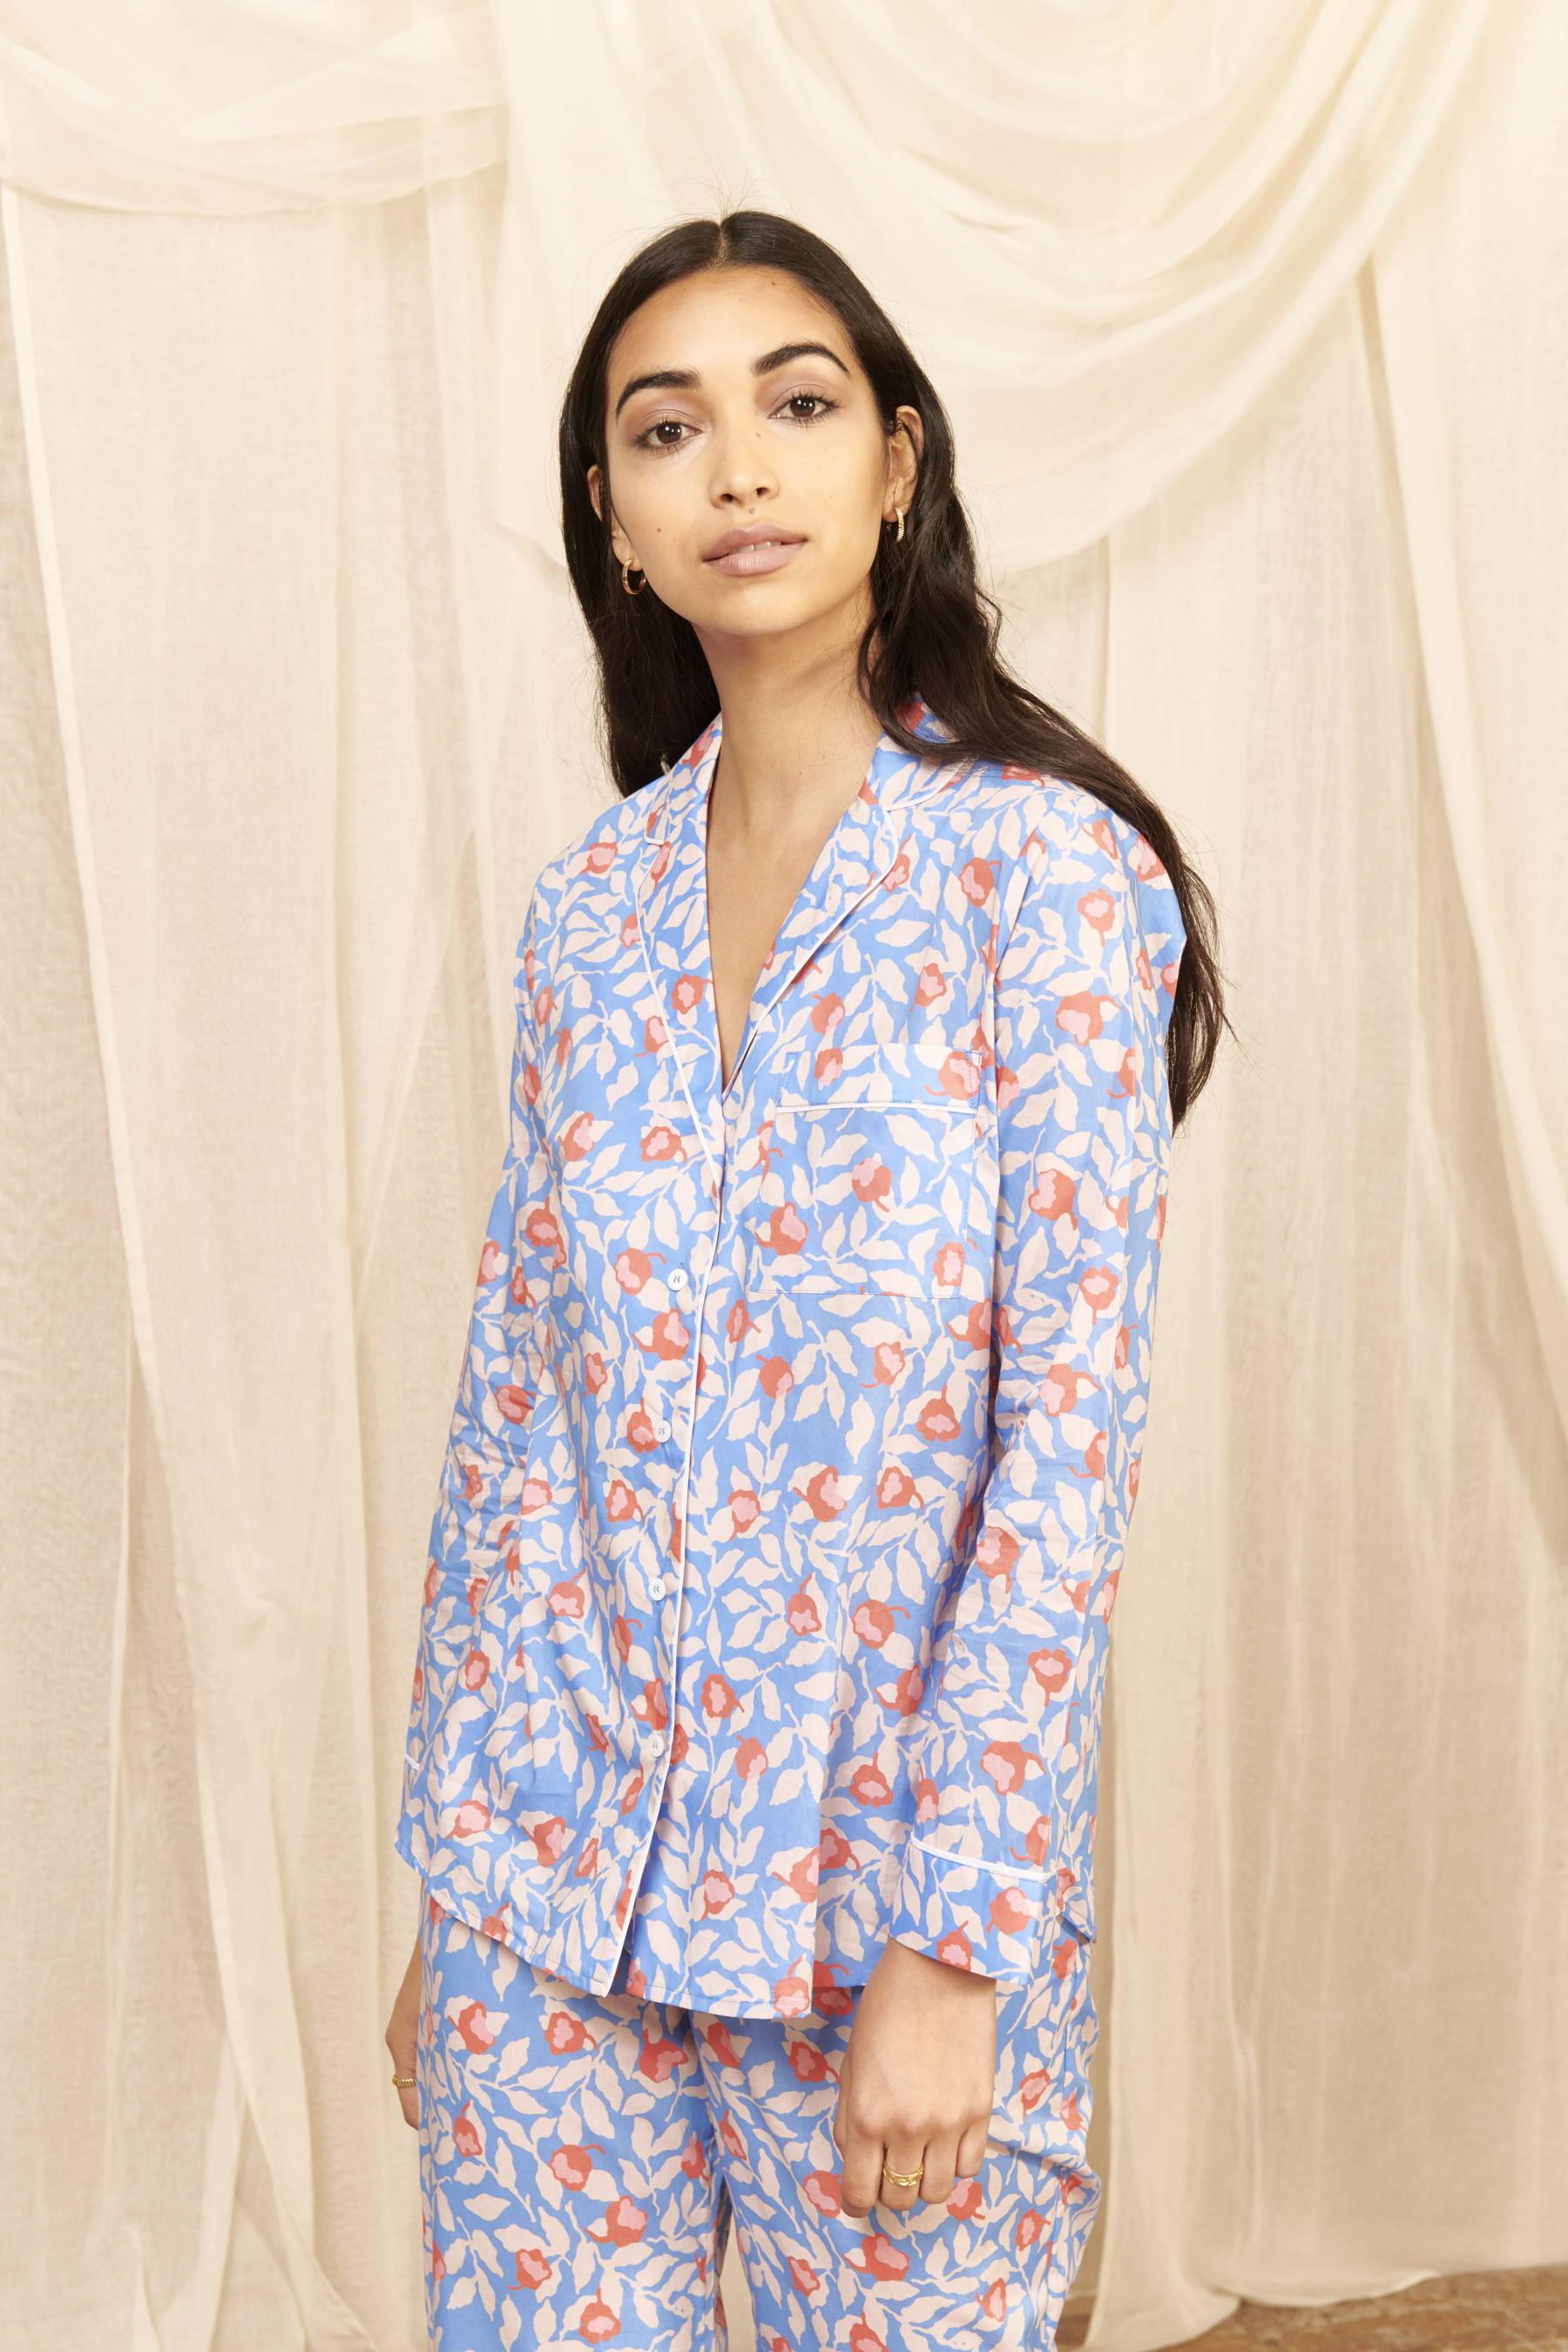 Nectarine Women's Cotton Pyjama Set   Cotton Pyjama Sets   YOLKE